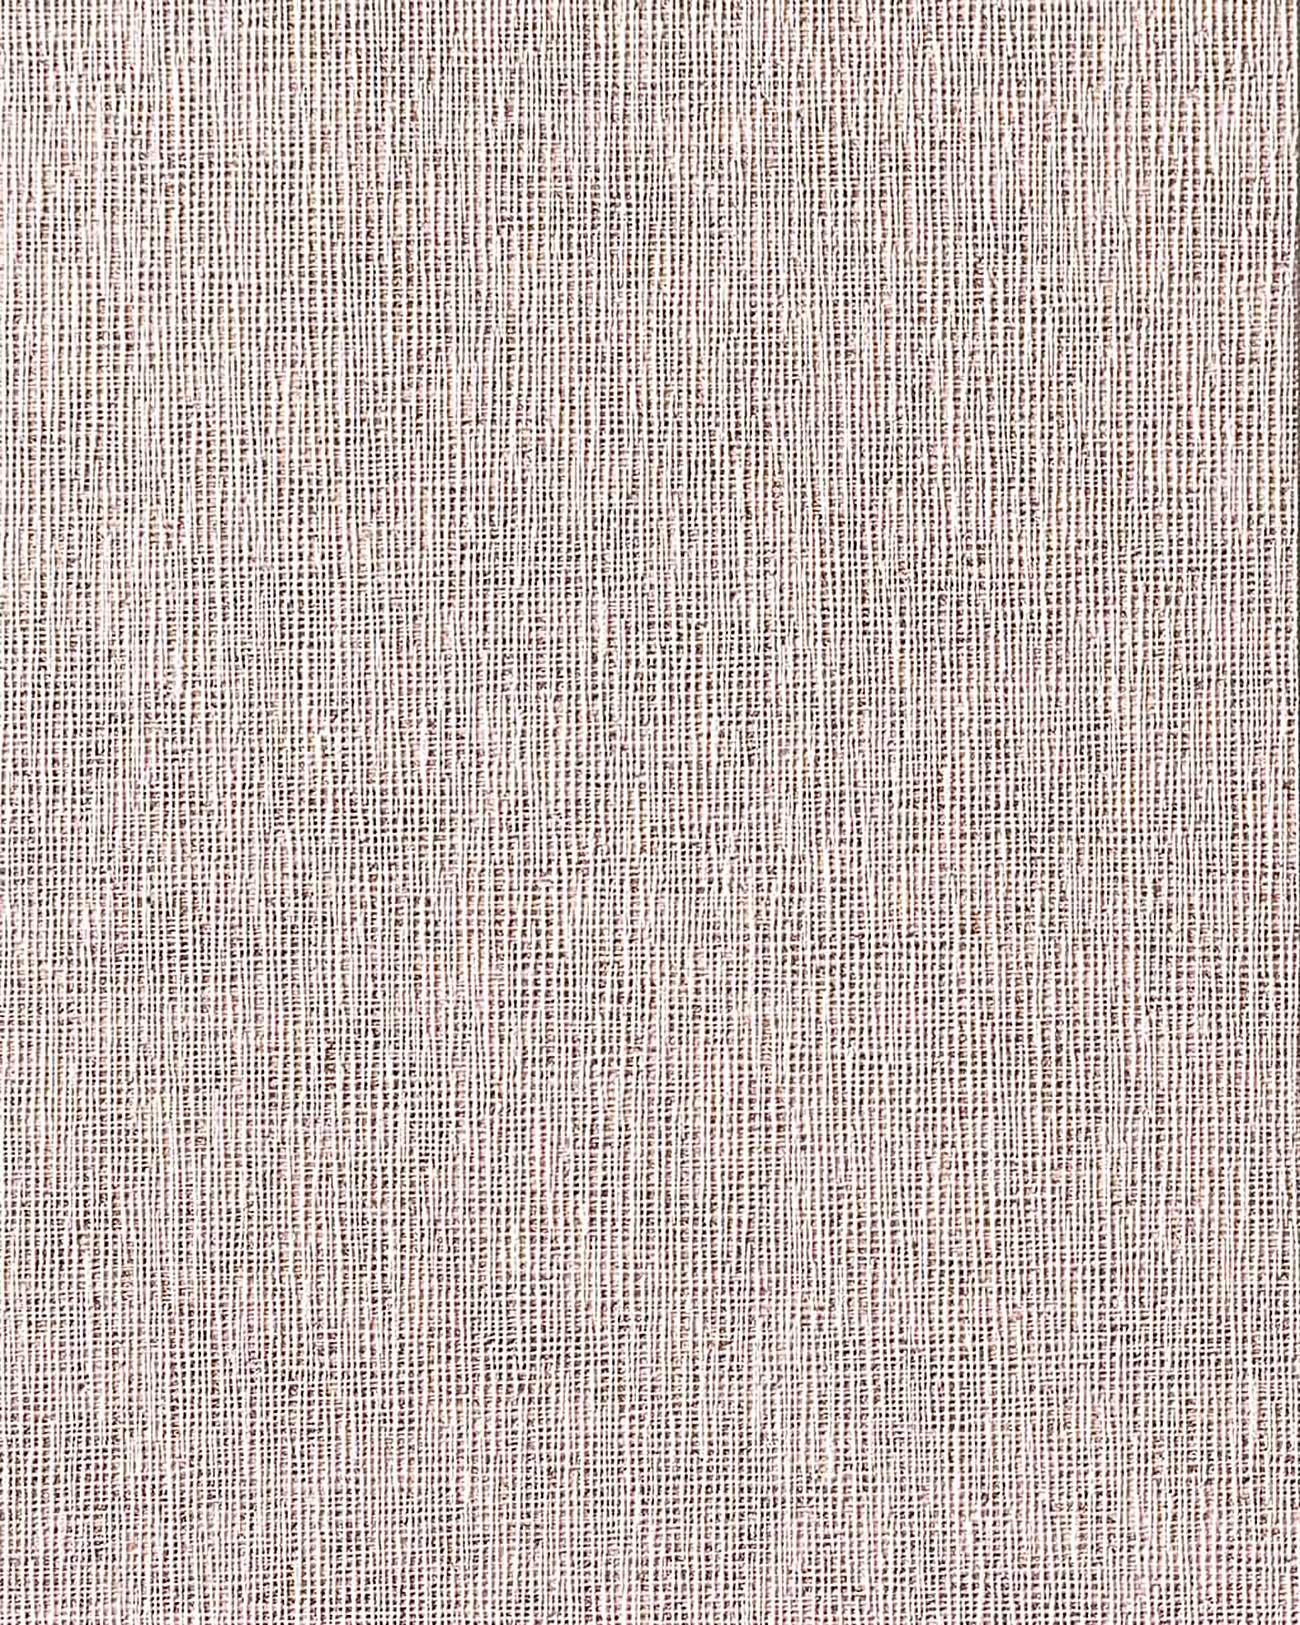 Papel pintado con textura de tela de lino en vinlico EDEM